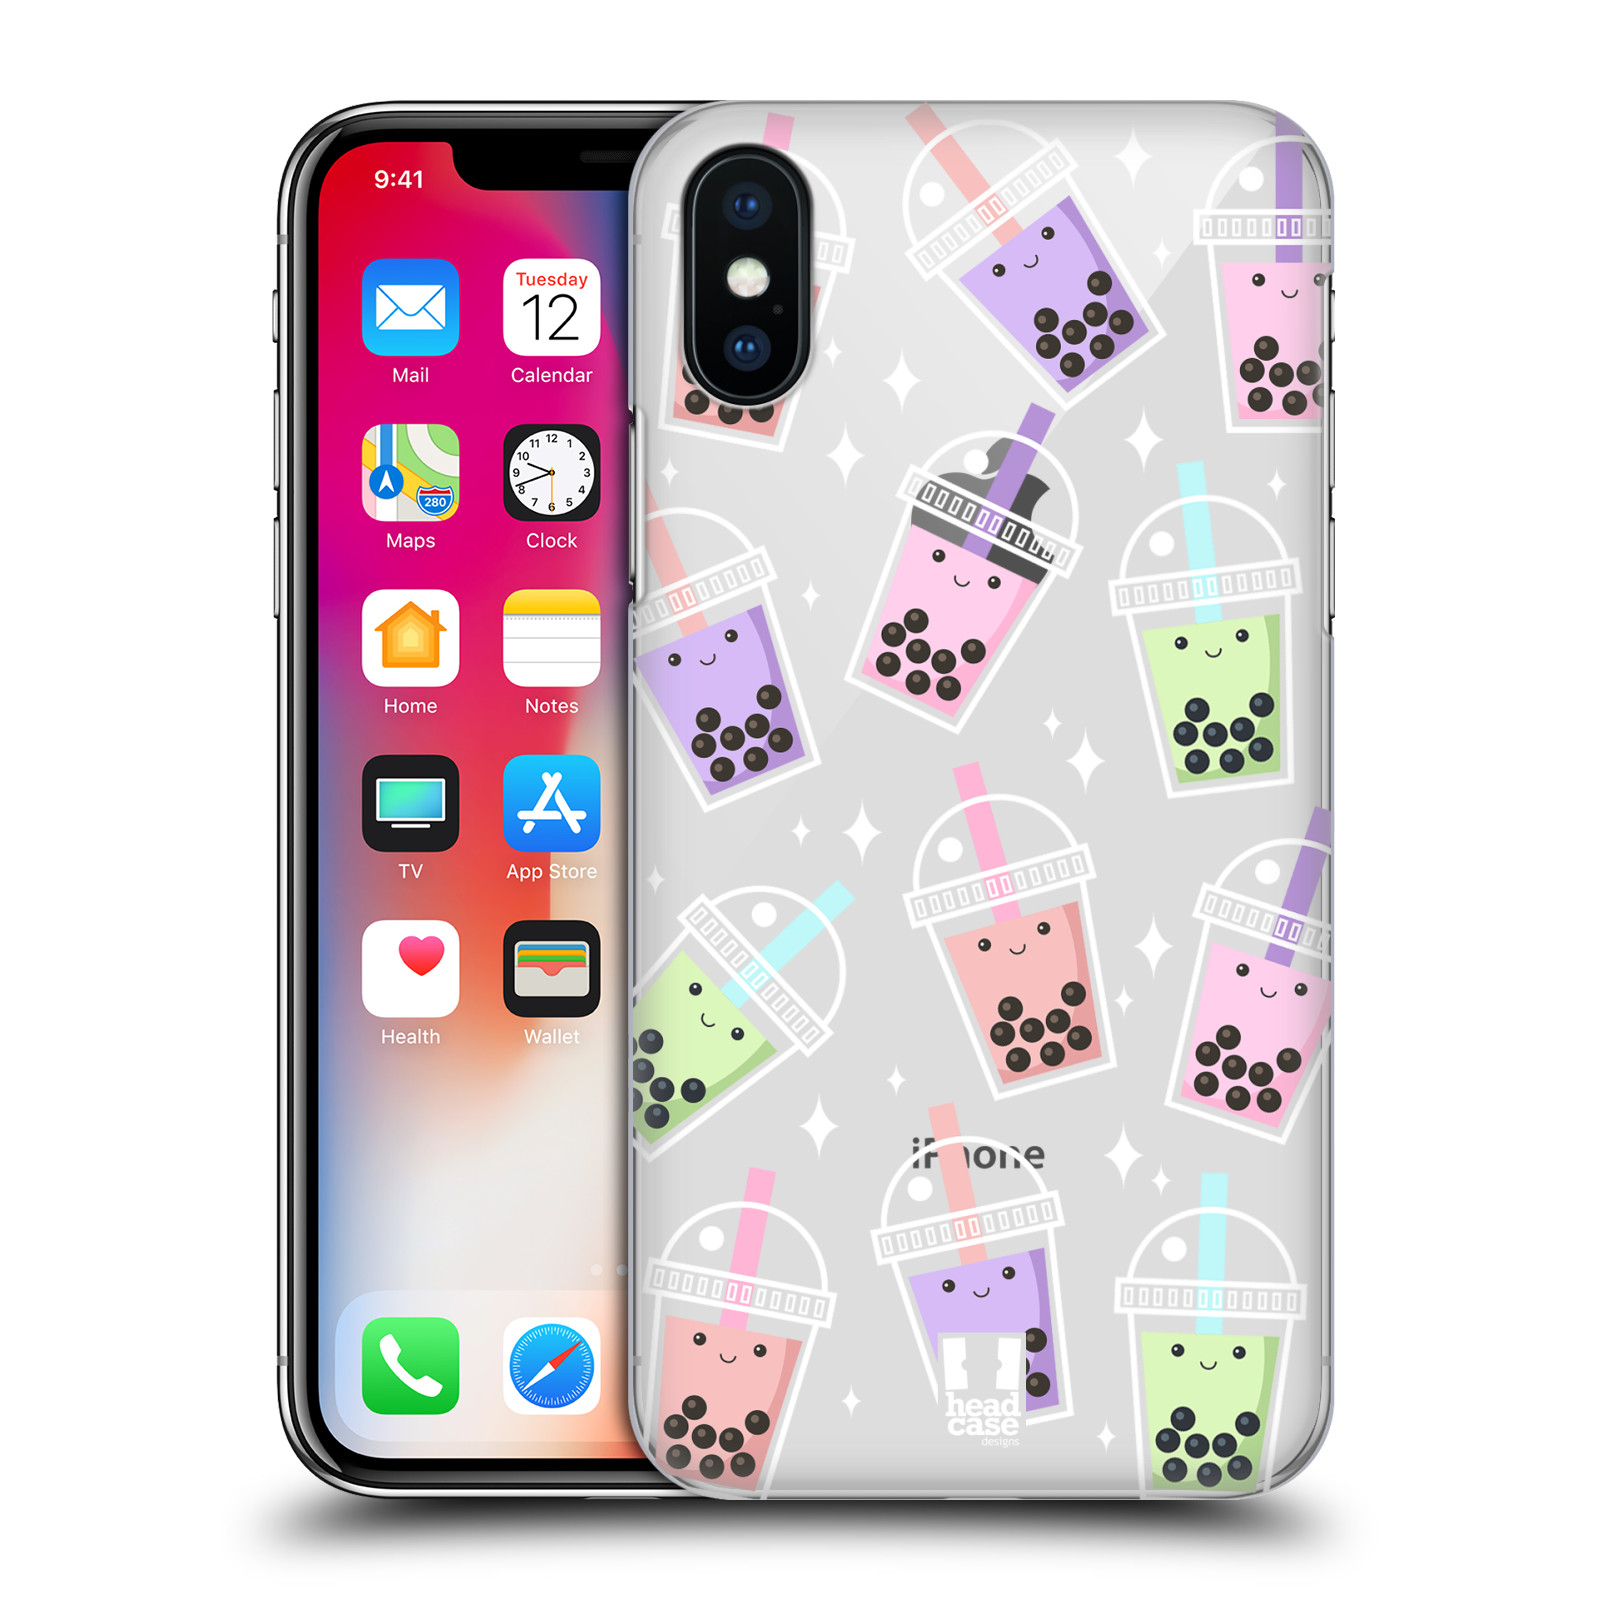 HEAD-CASE-DESIGNS-BUBBLE-TEA-HARD-BACK-CASE-FOR-APPLE-iPHONE-PHONES